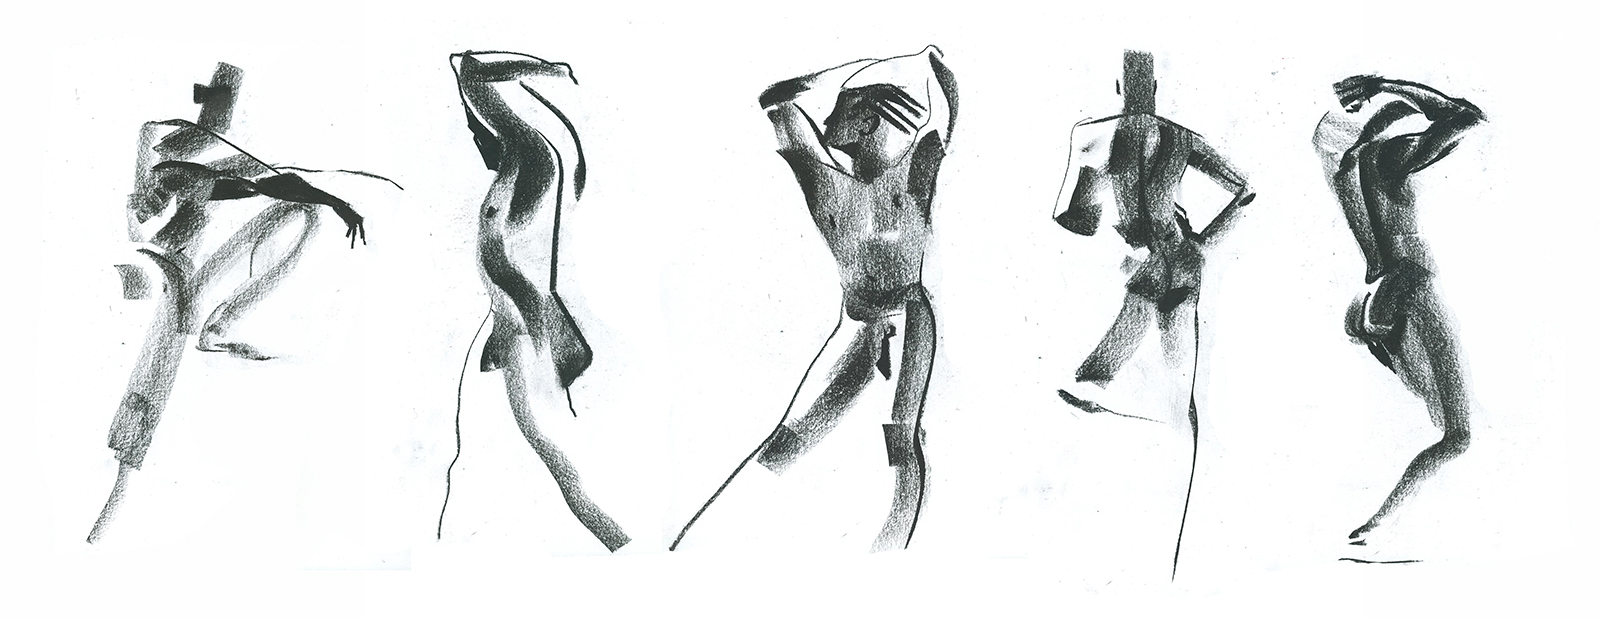 Charcoal, 3 min poses